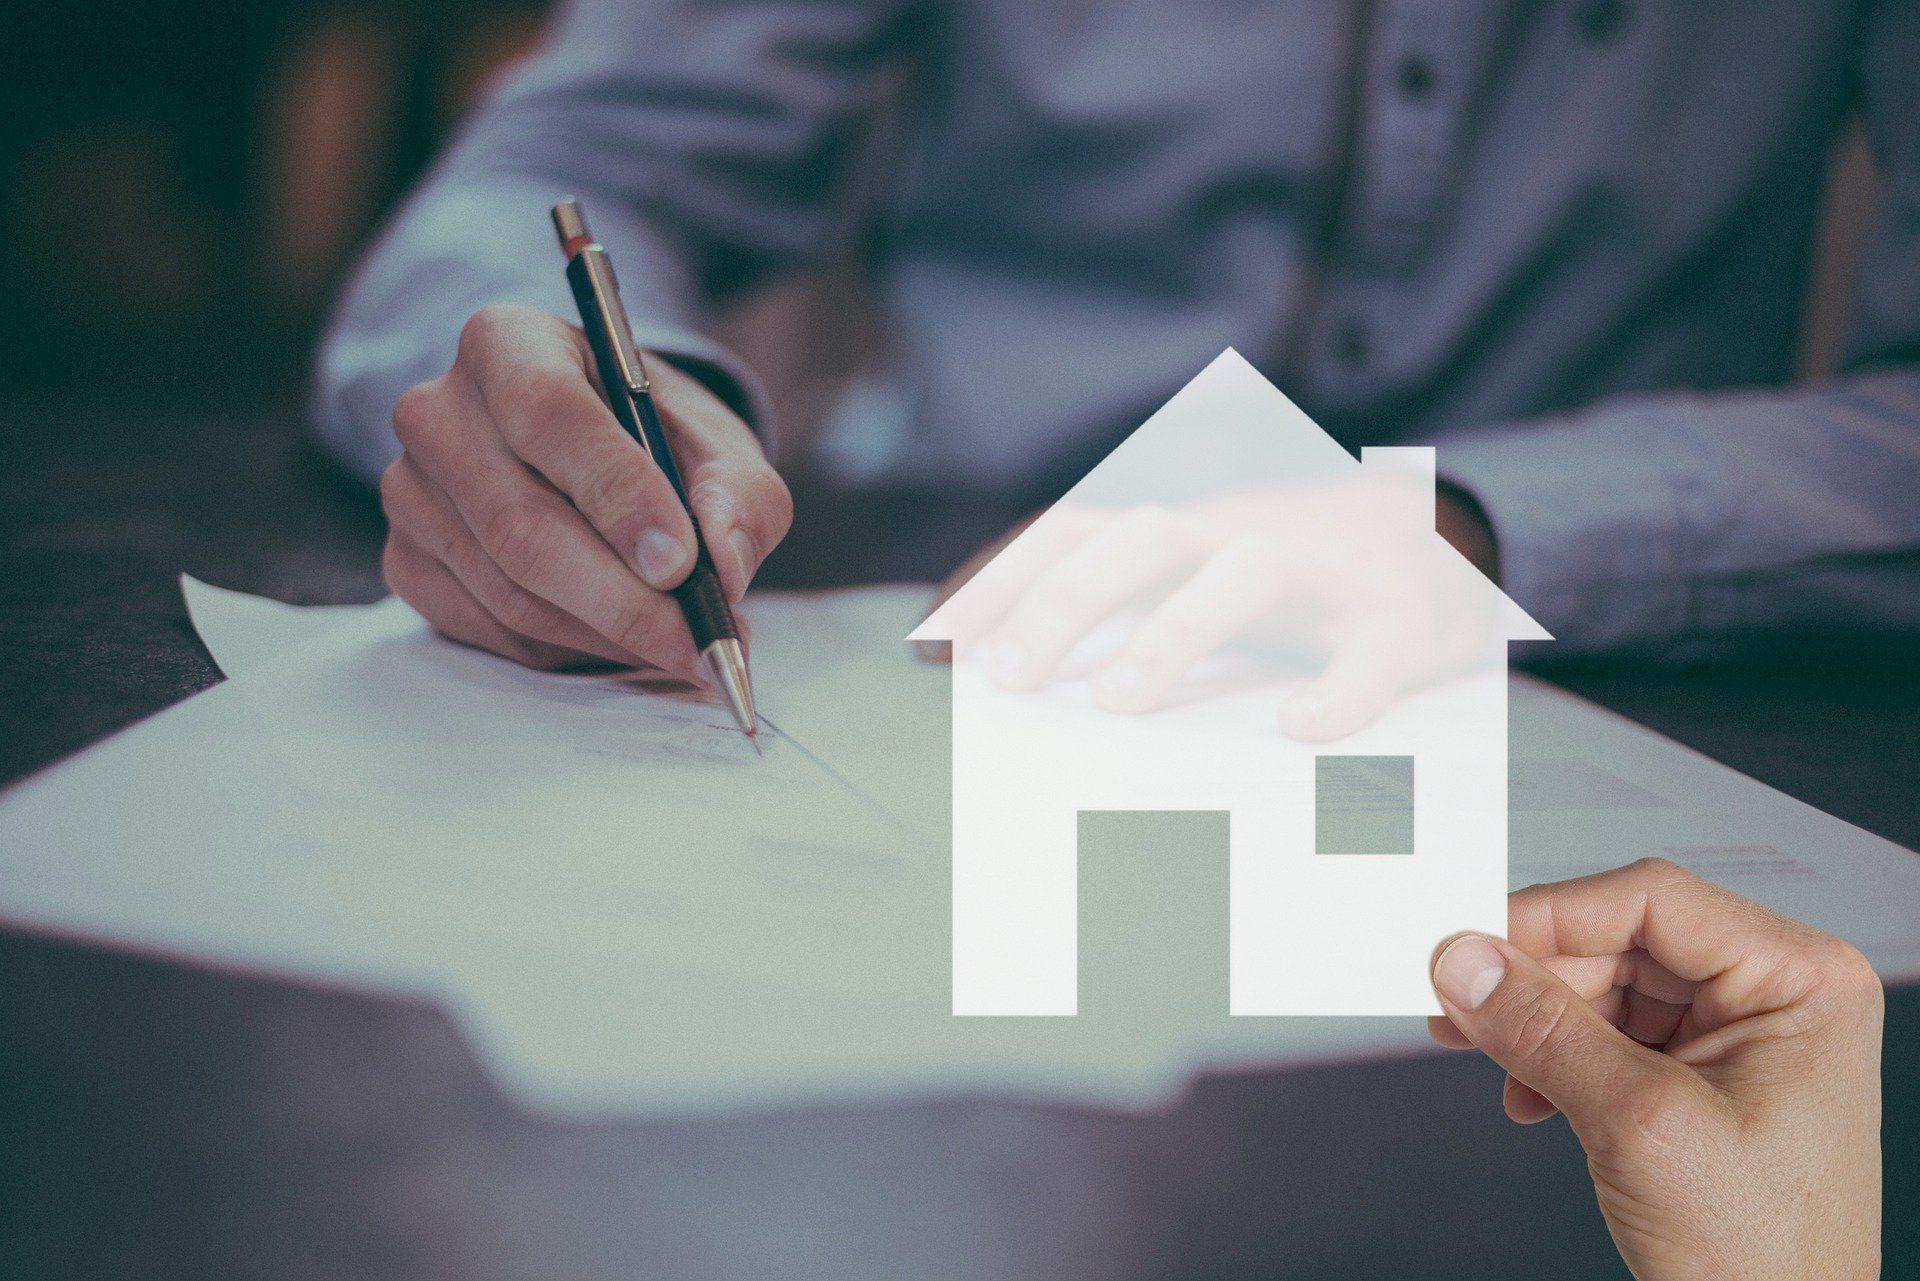 daň z nemovitosti 2021